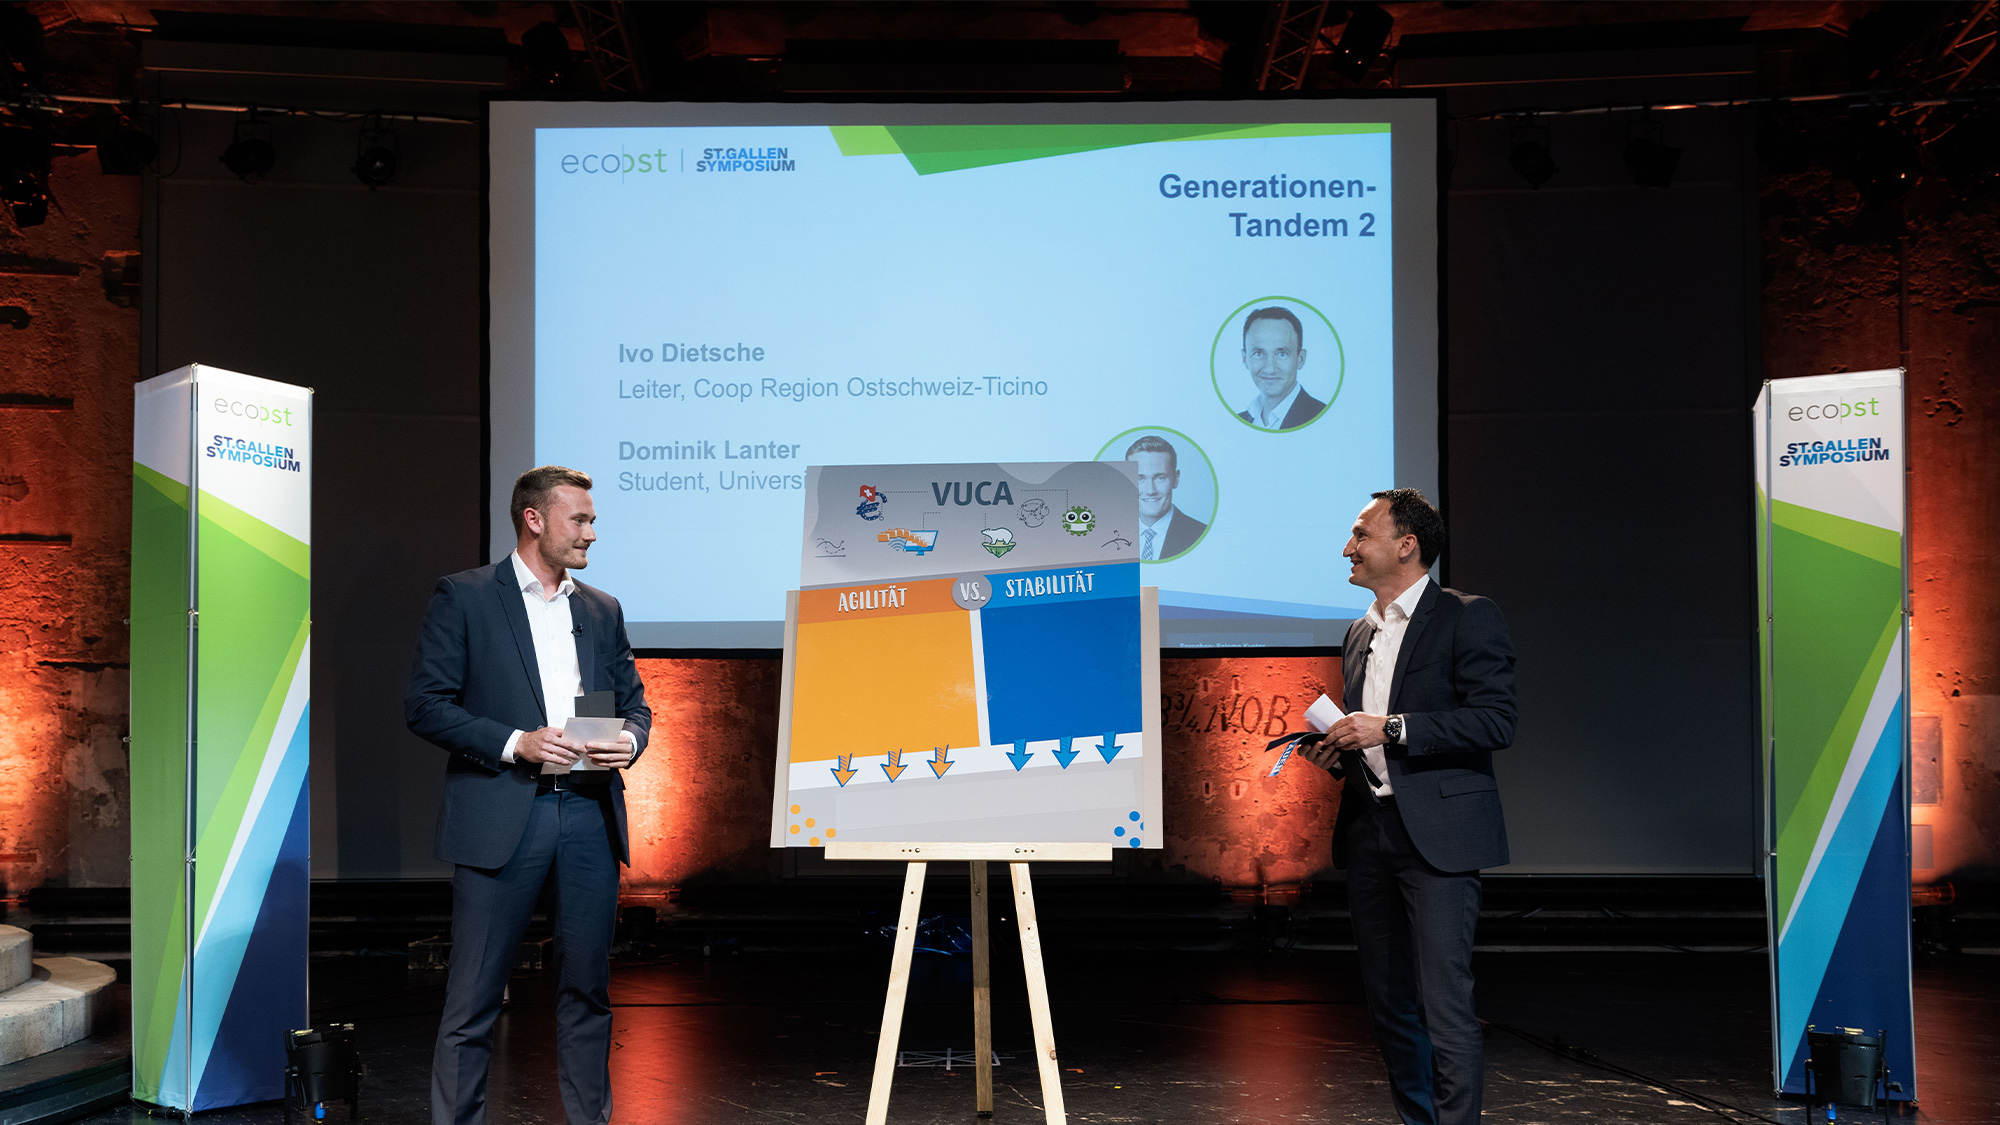 Ivo Dietsche and Dominik Lanter at the EcoOst St.Gallen Symposium 2021